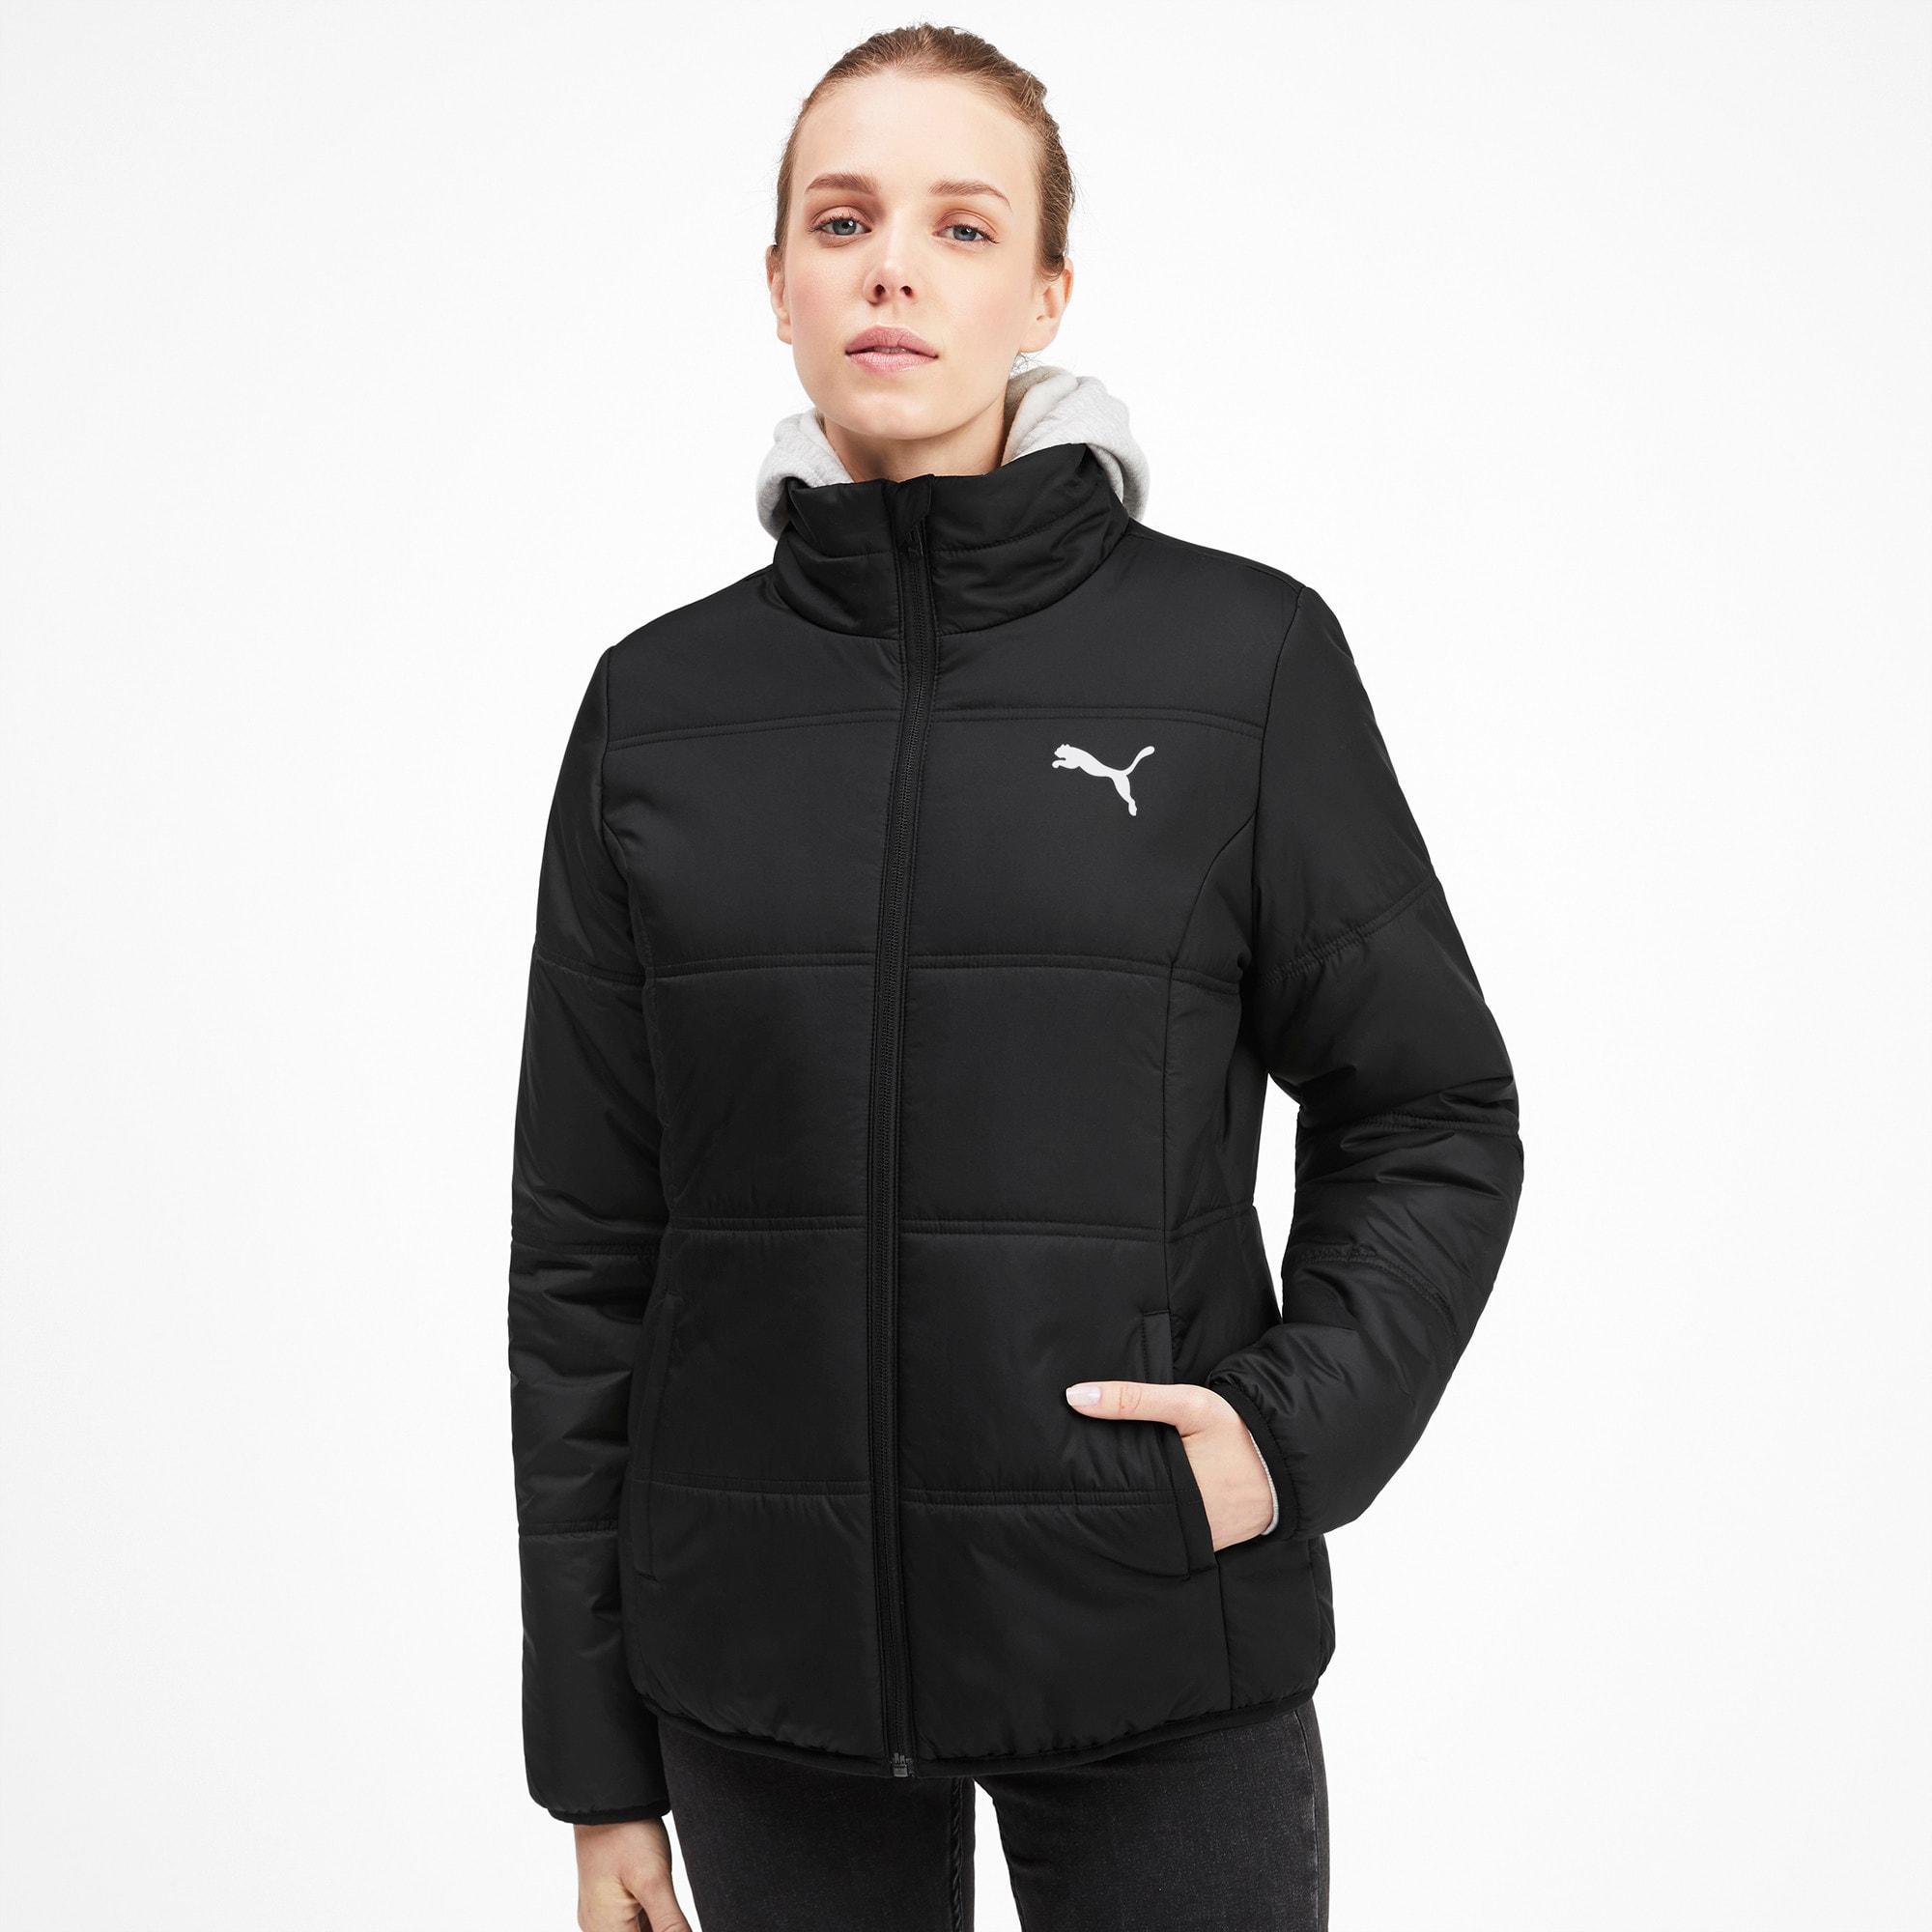 Thumbnail 1 of Essentials Padded Women's Jacket, Puma Black, medium